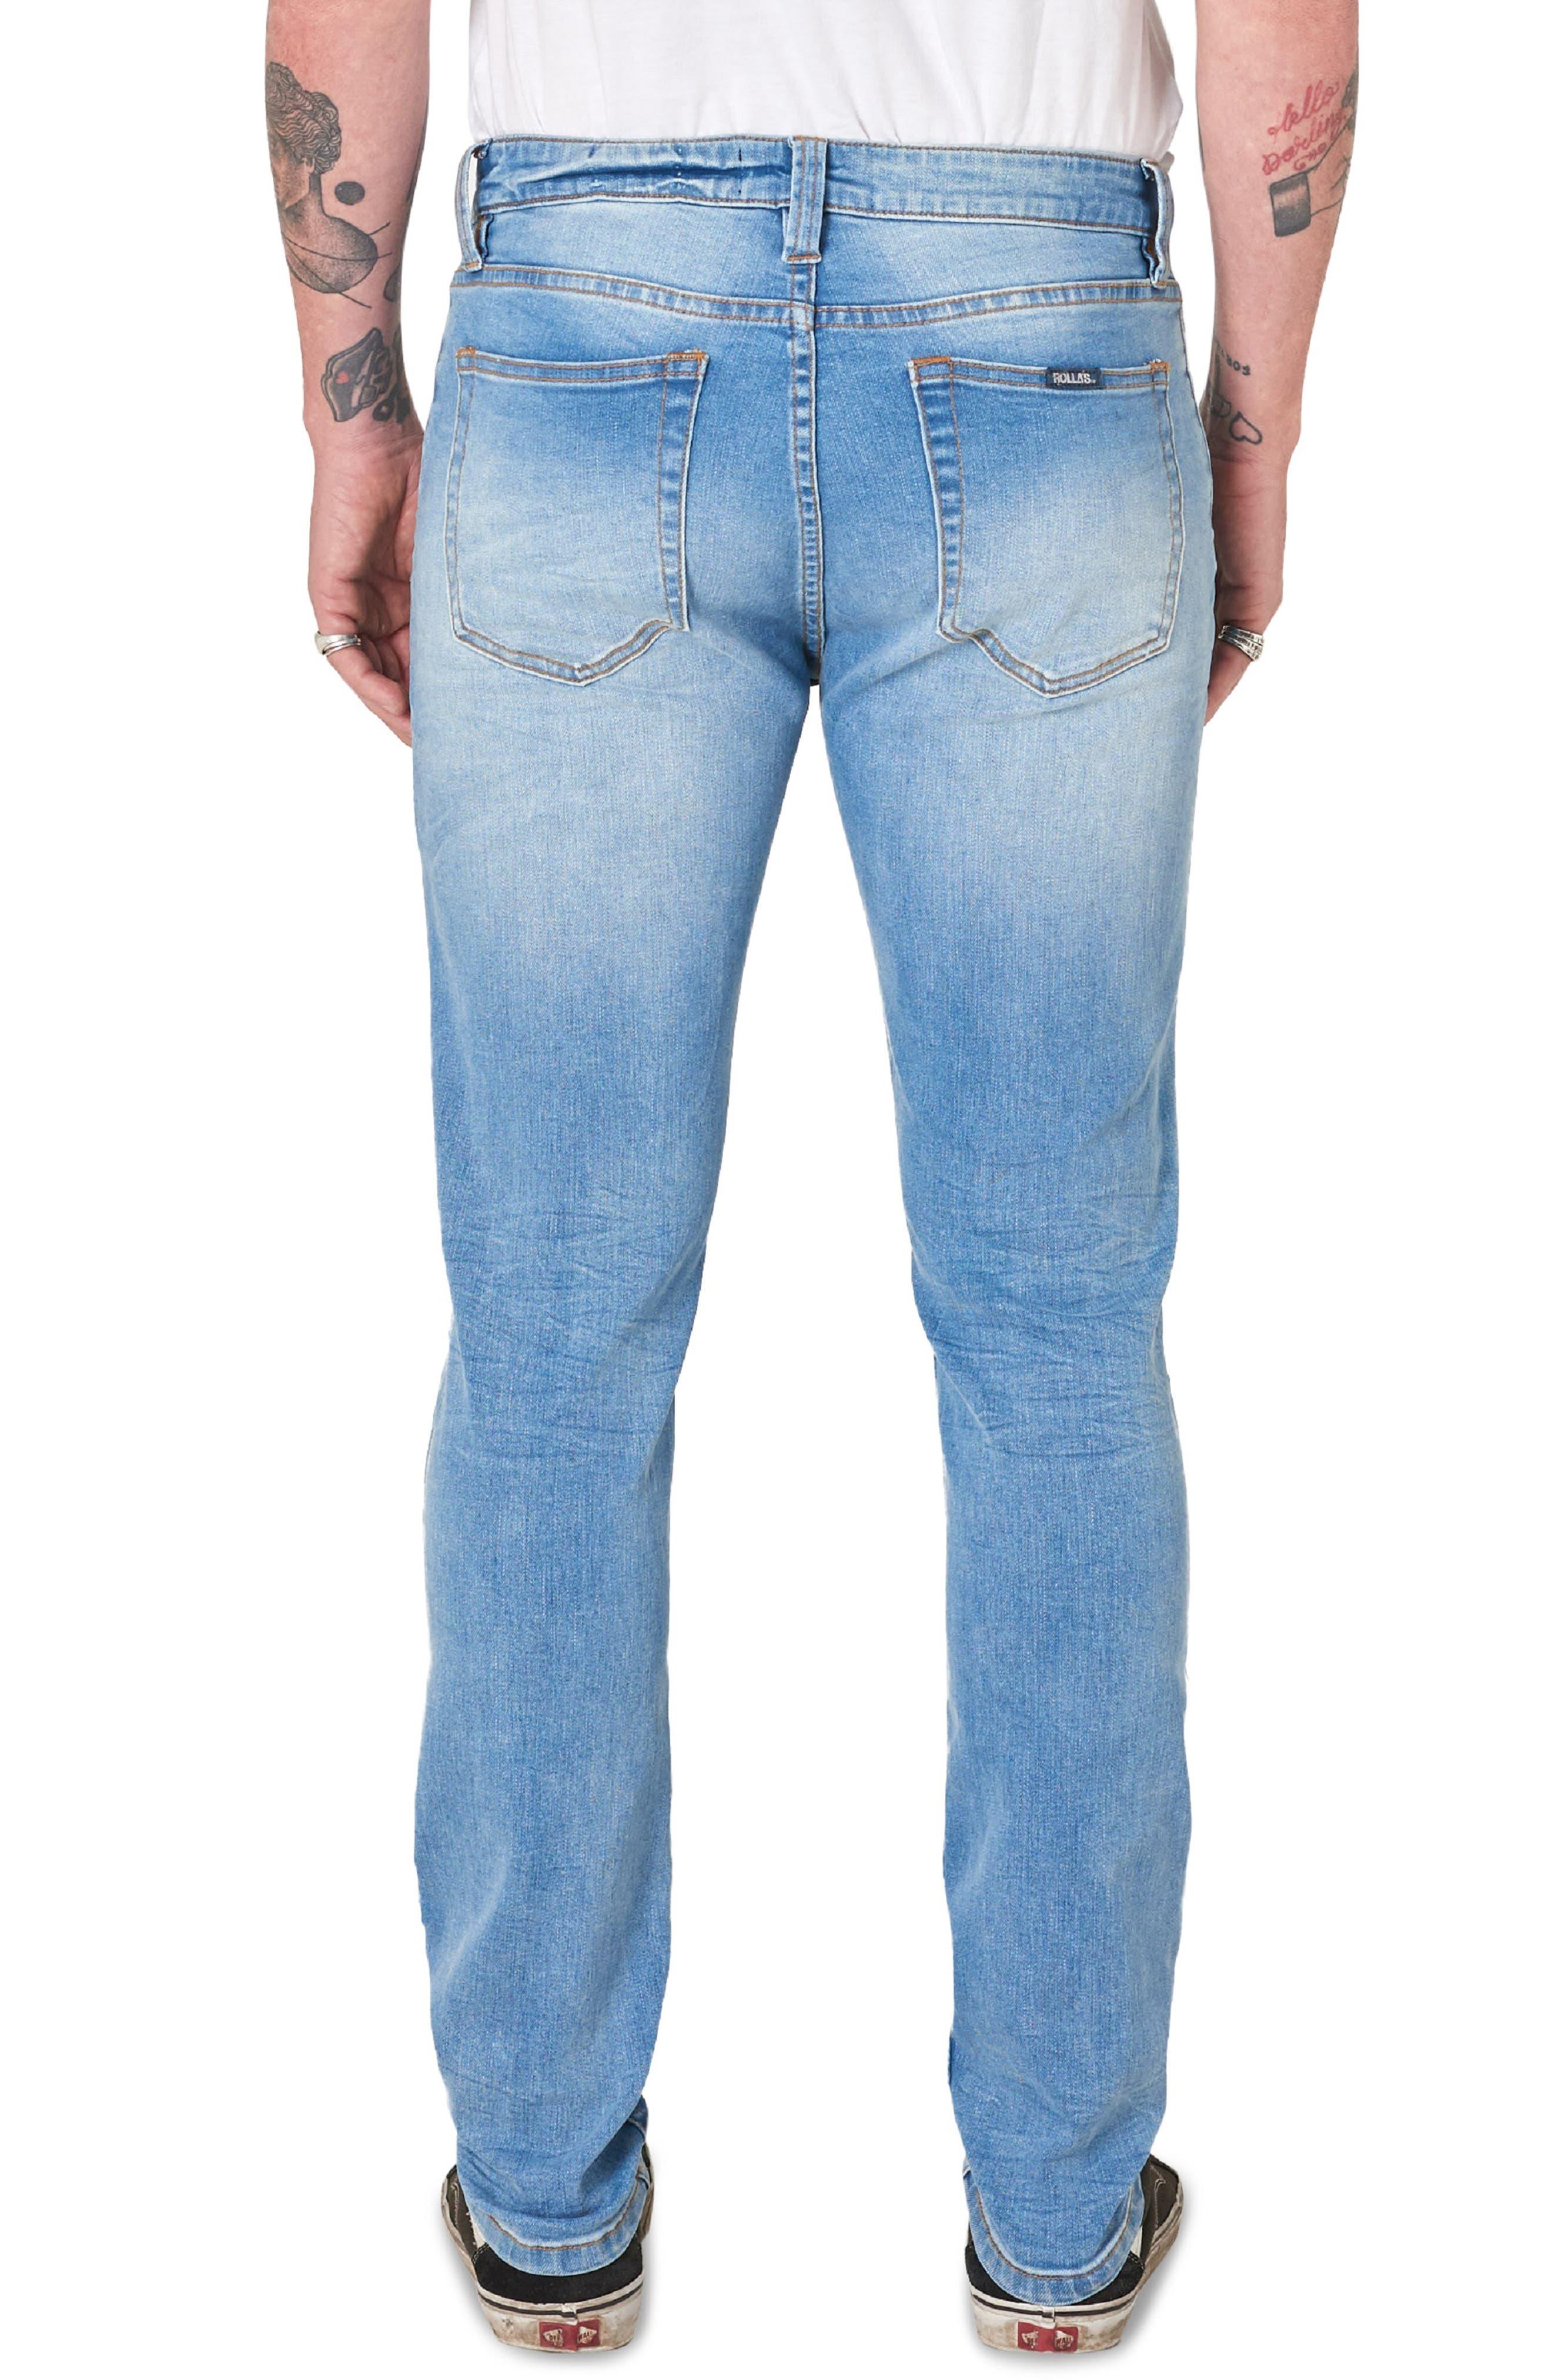 Stinger Skinny Fit Jeans,                             Alternate thumbnail 2, color,                             AUTHENTIC BLUE